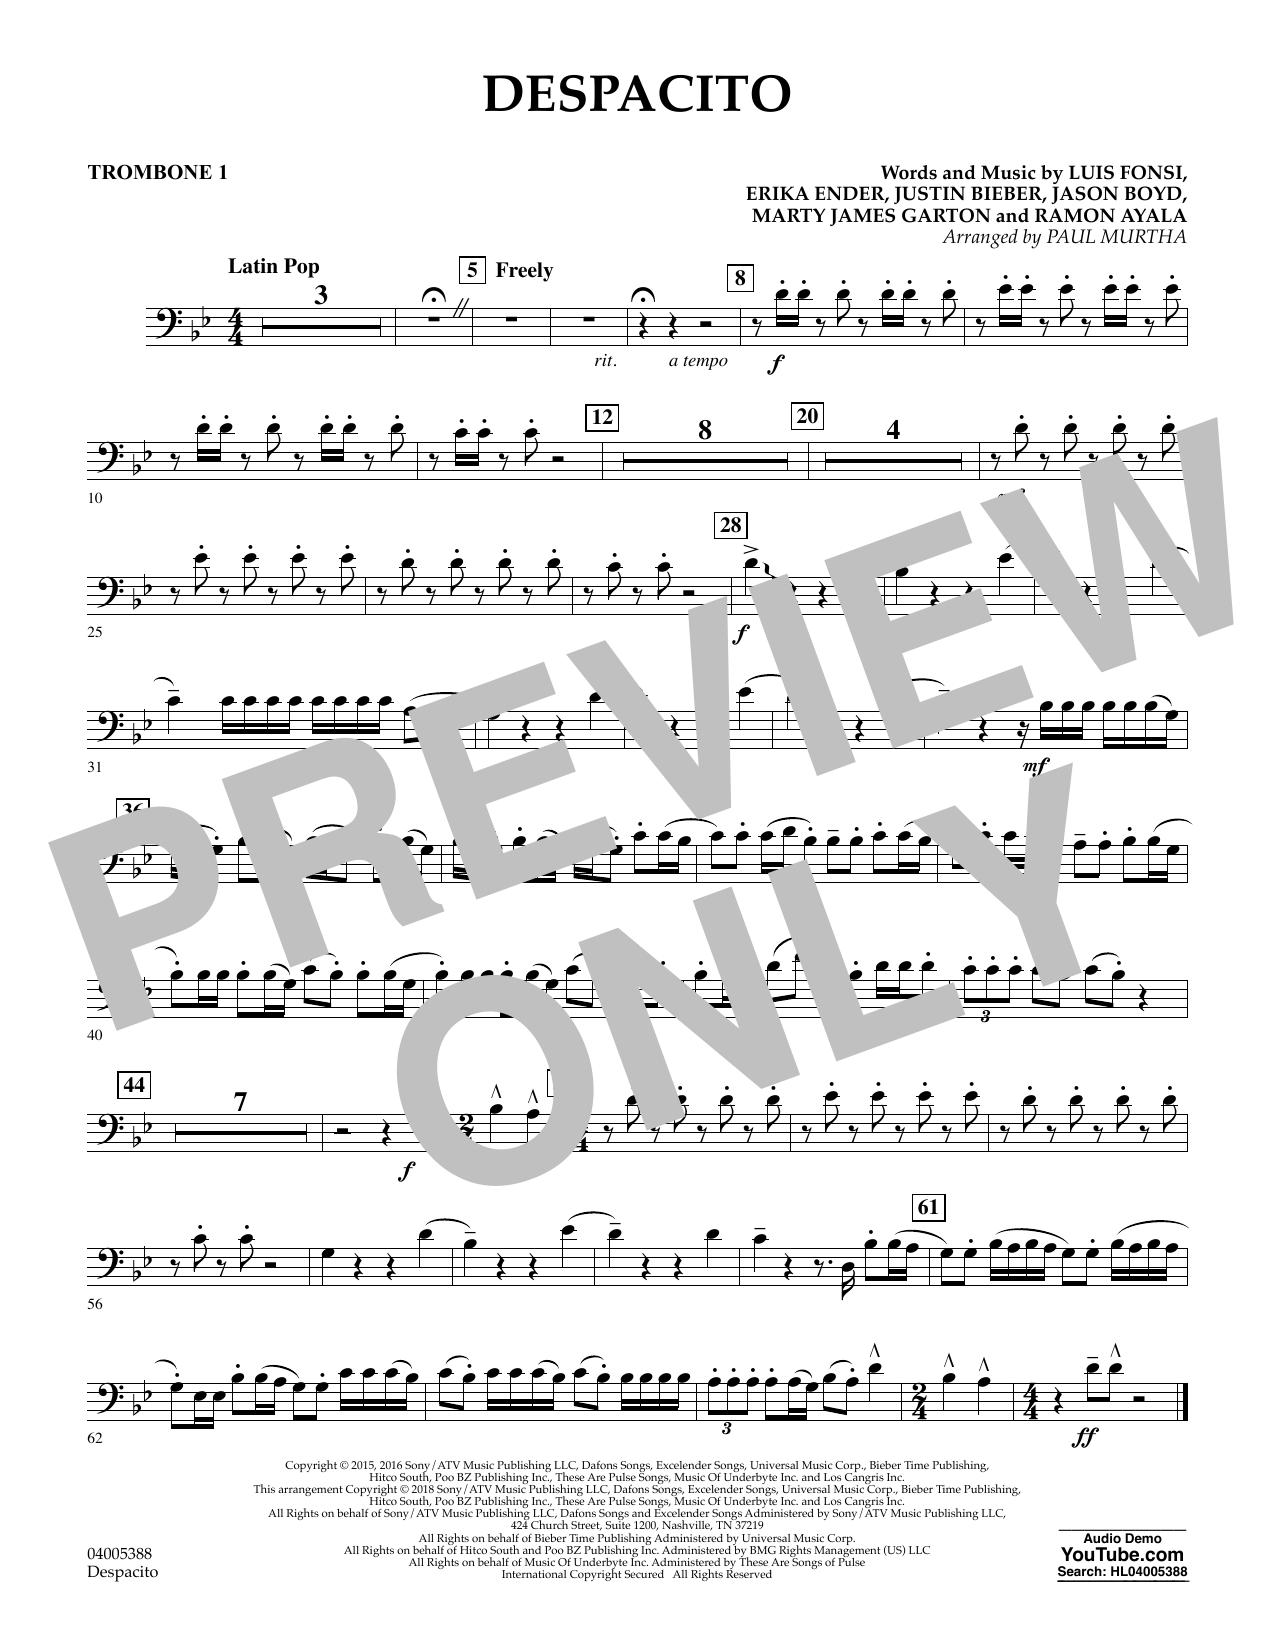 Despacito (arr. Paul Murtha) - Trombone 1 (Concert Band)